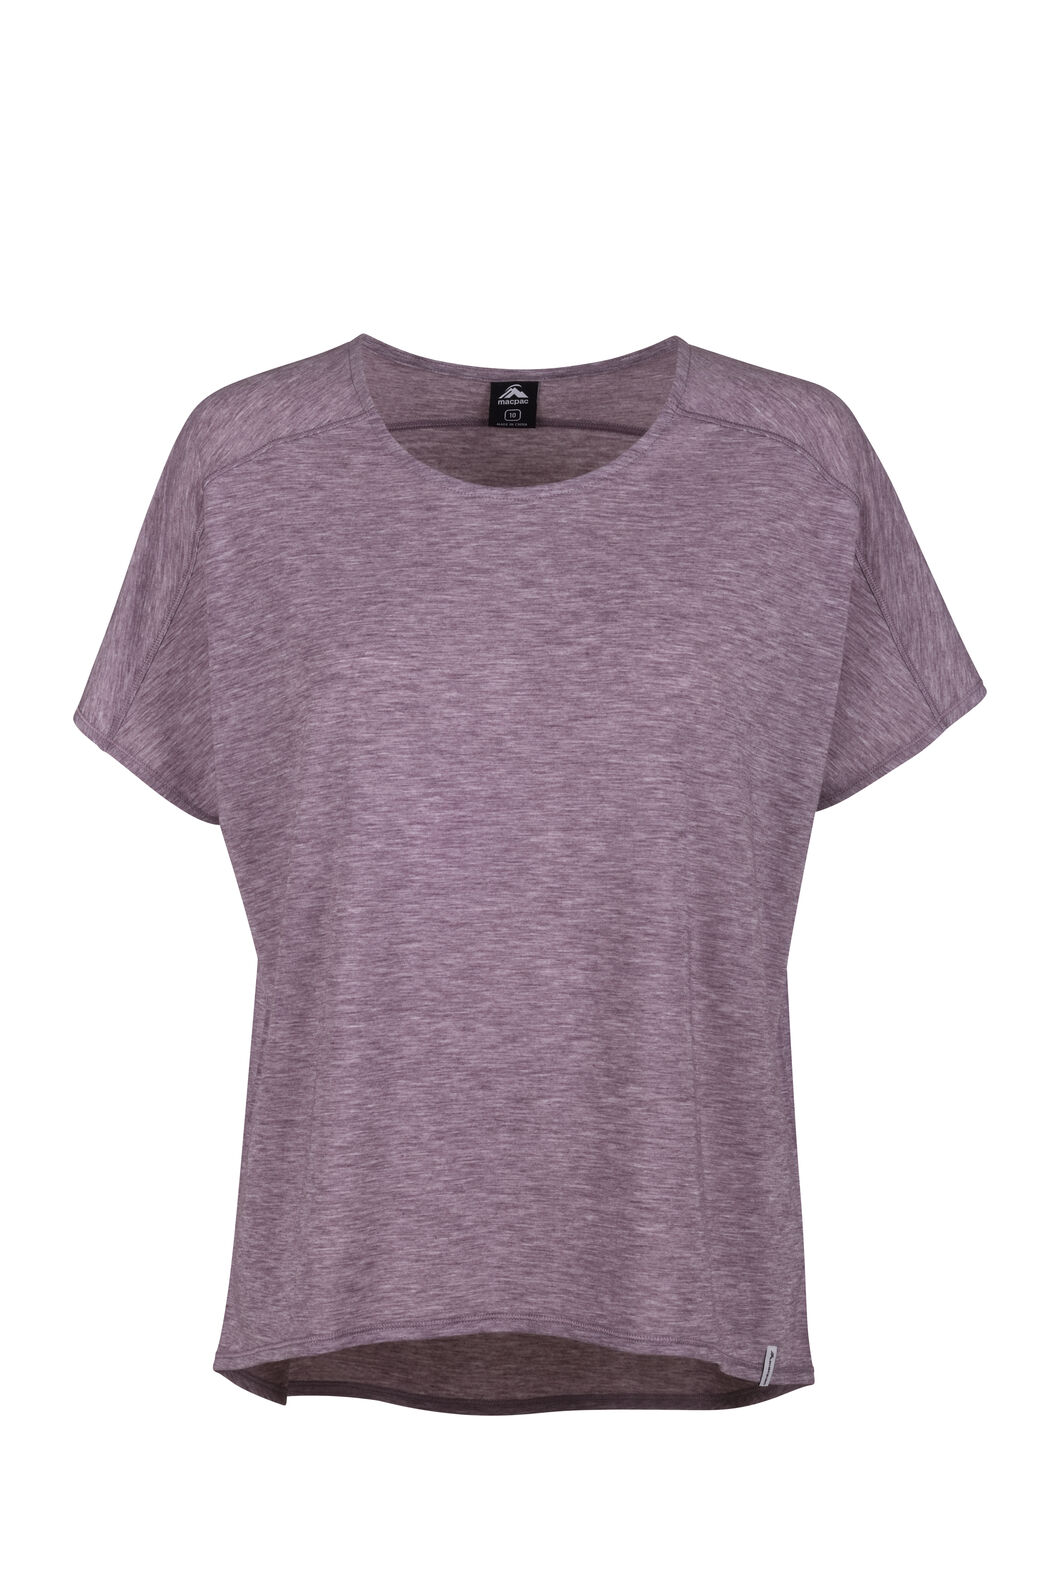 Macpac Eva Short Sleeve Tee — Women's, Fudge, hi-res